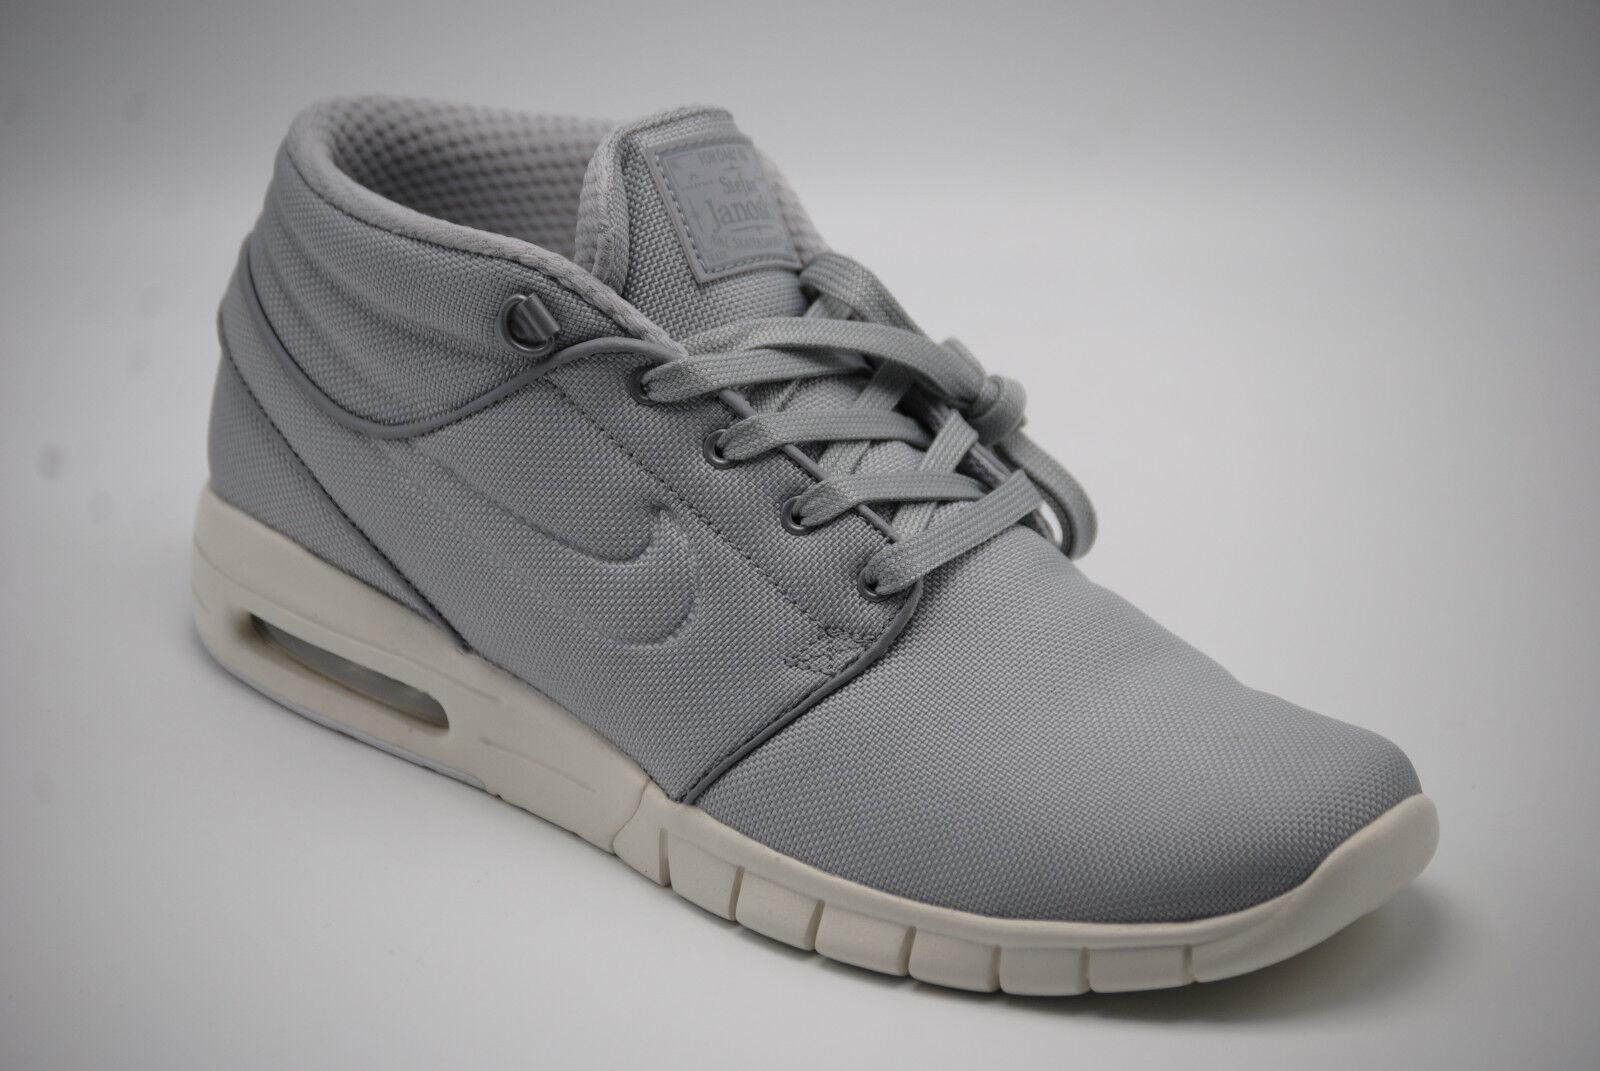 Nike Stefan Janoski Max Mid Uomo skateboard shoes 807507 004 Multiple sizes